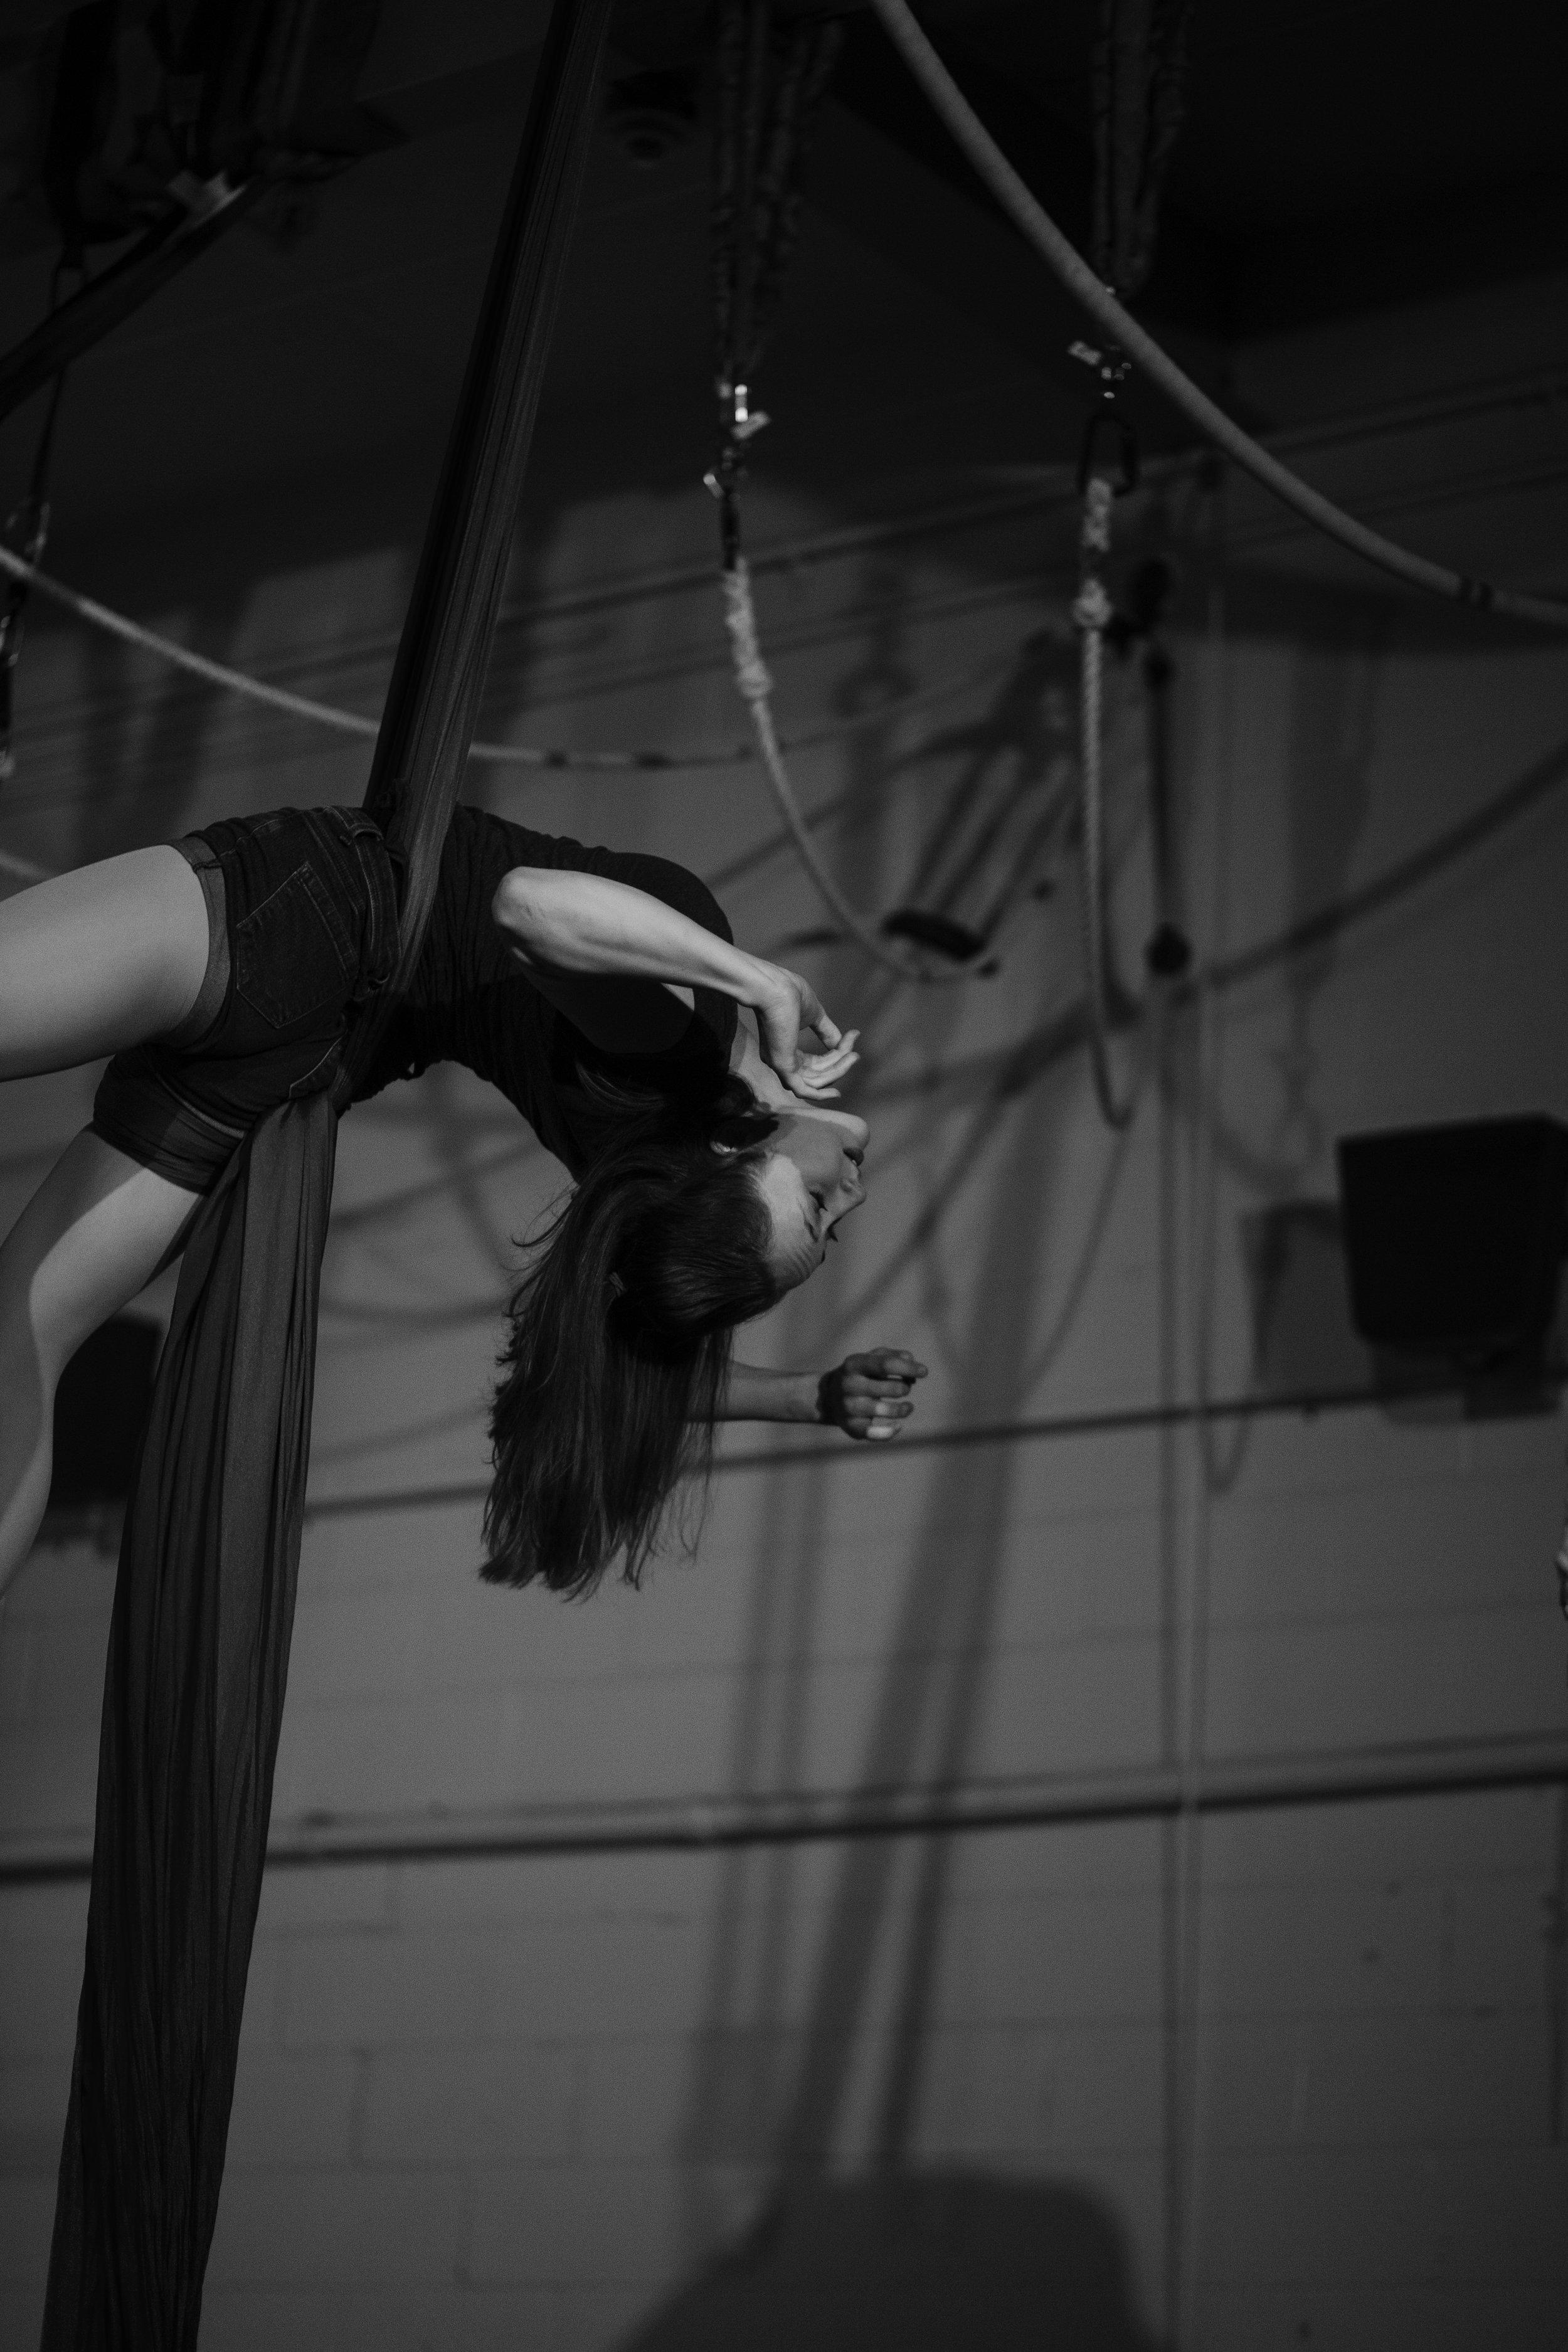 Circus Cabaret, Ithaca NY, April 2018